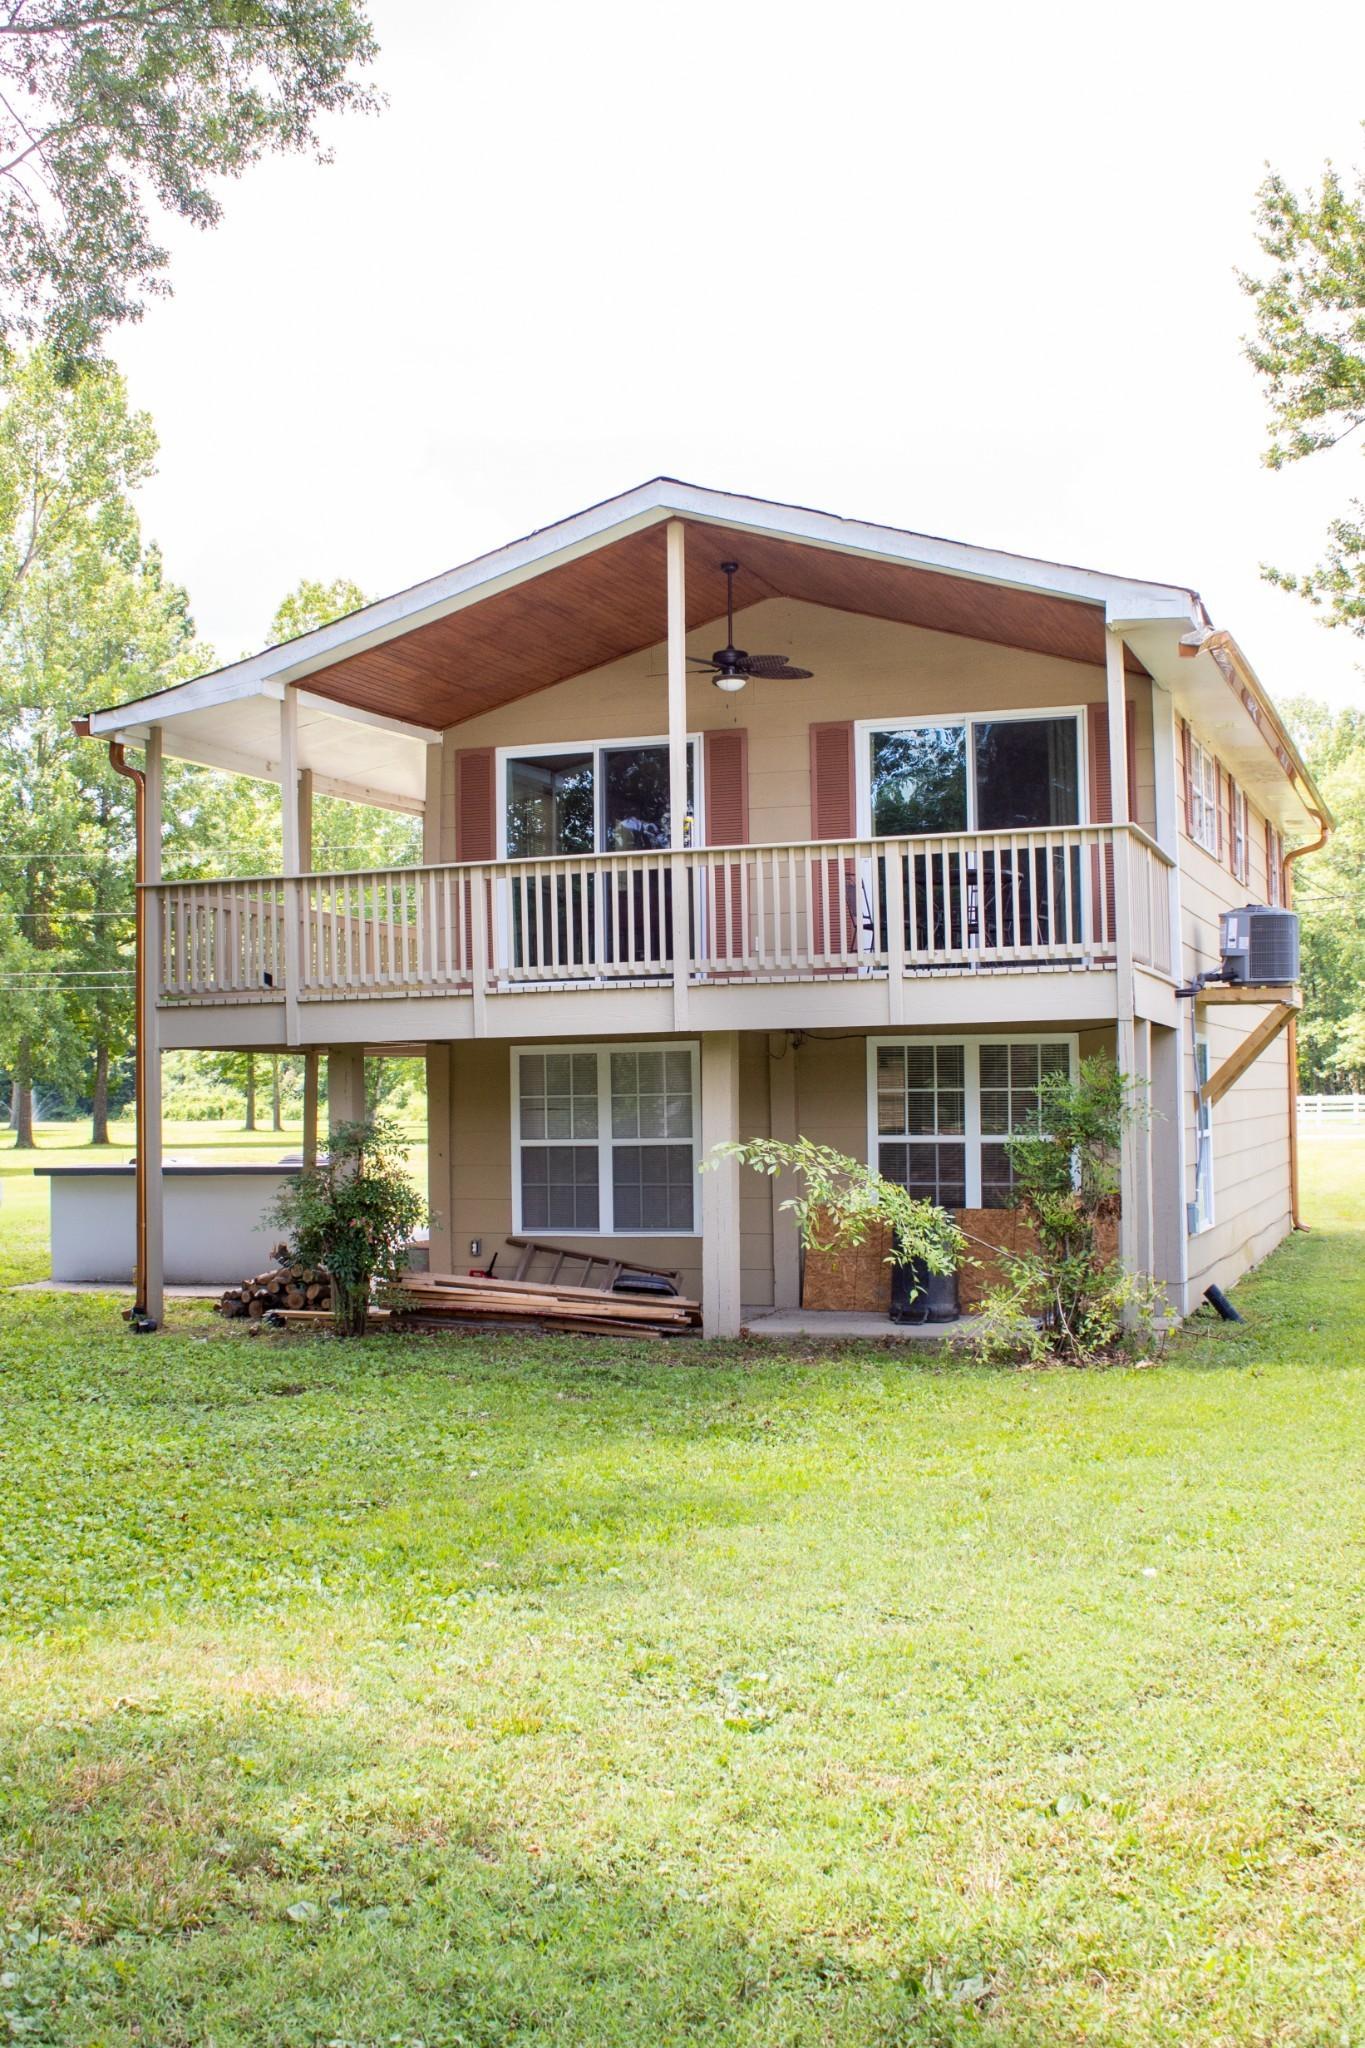 1541 Matlock Dr Property Photo - Chapmansboro, TN real estate listing